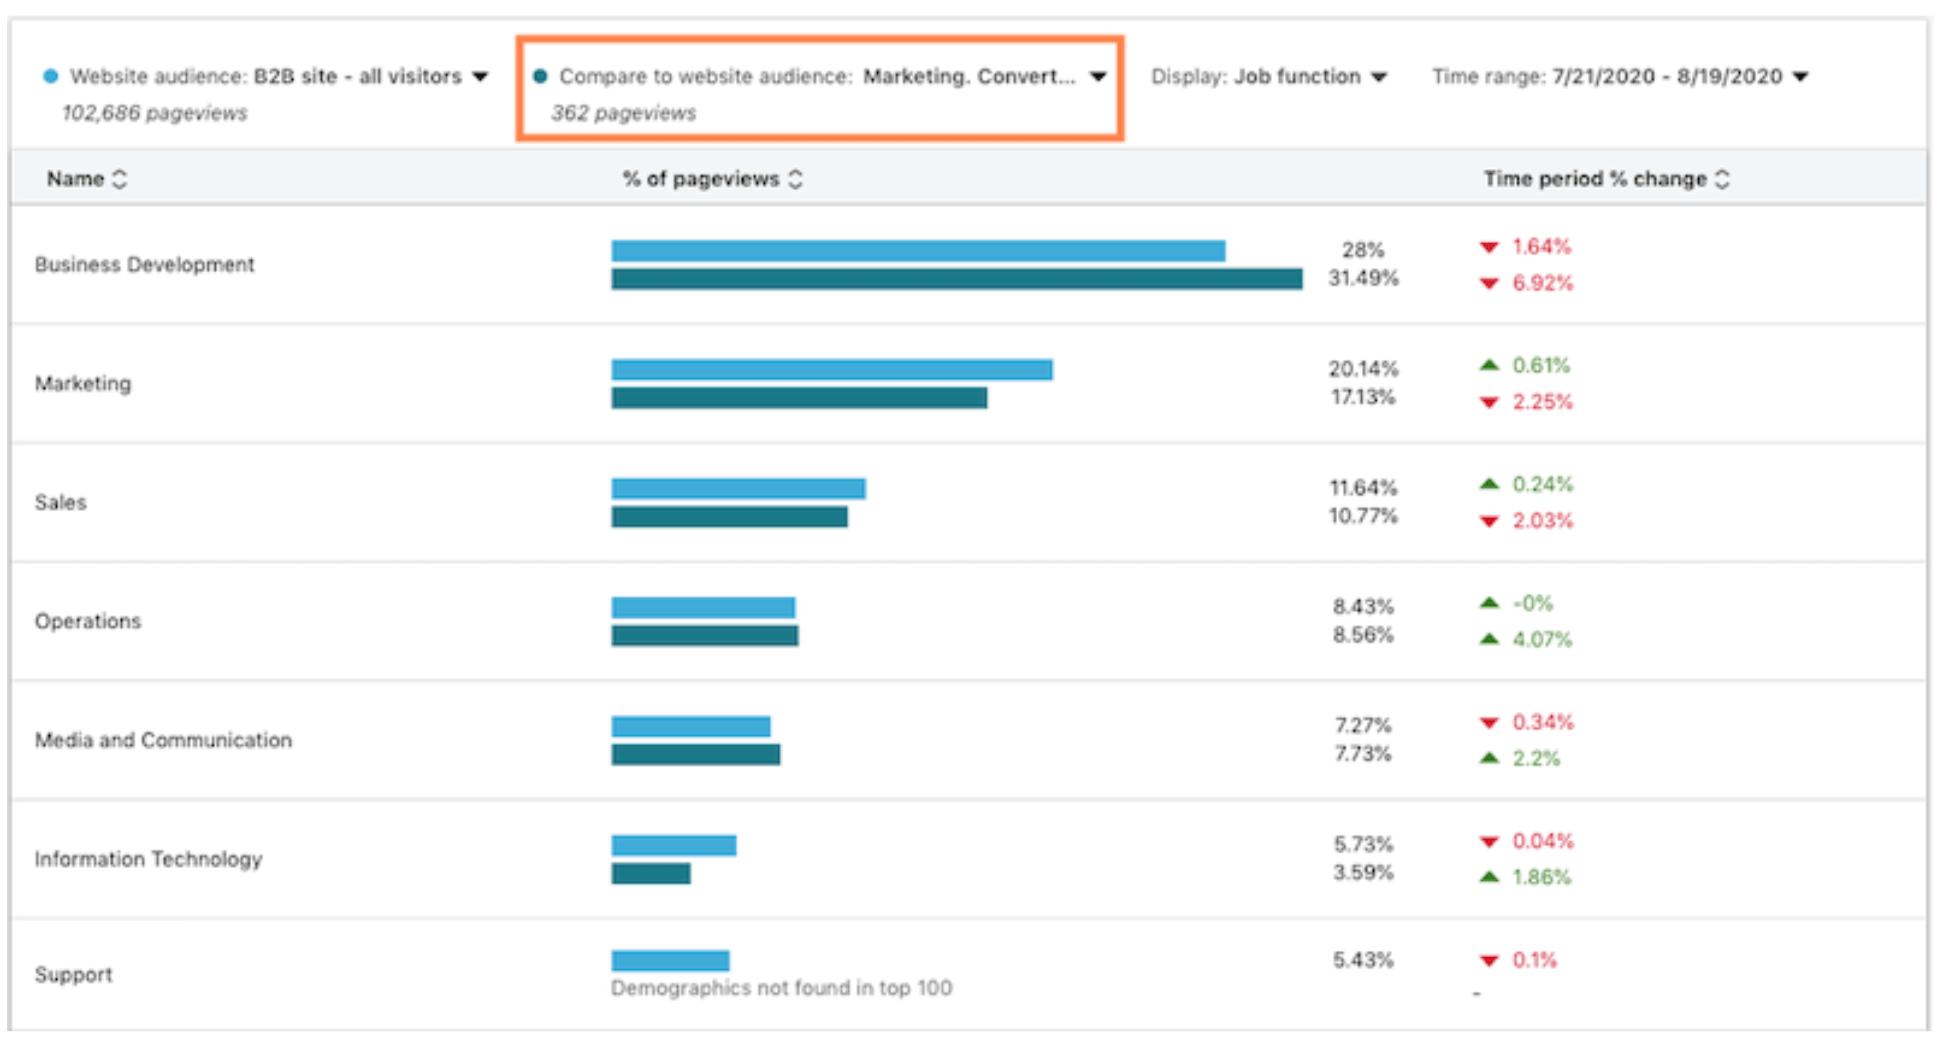 linkedin website demographics insights to inform ppc b2b marketing strategies